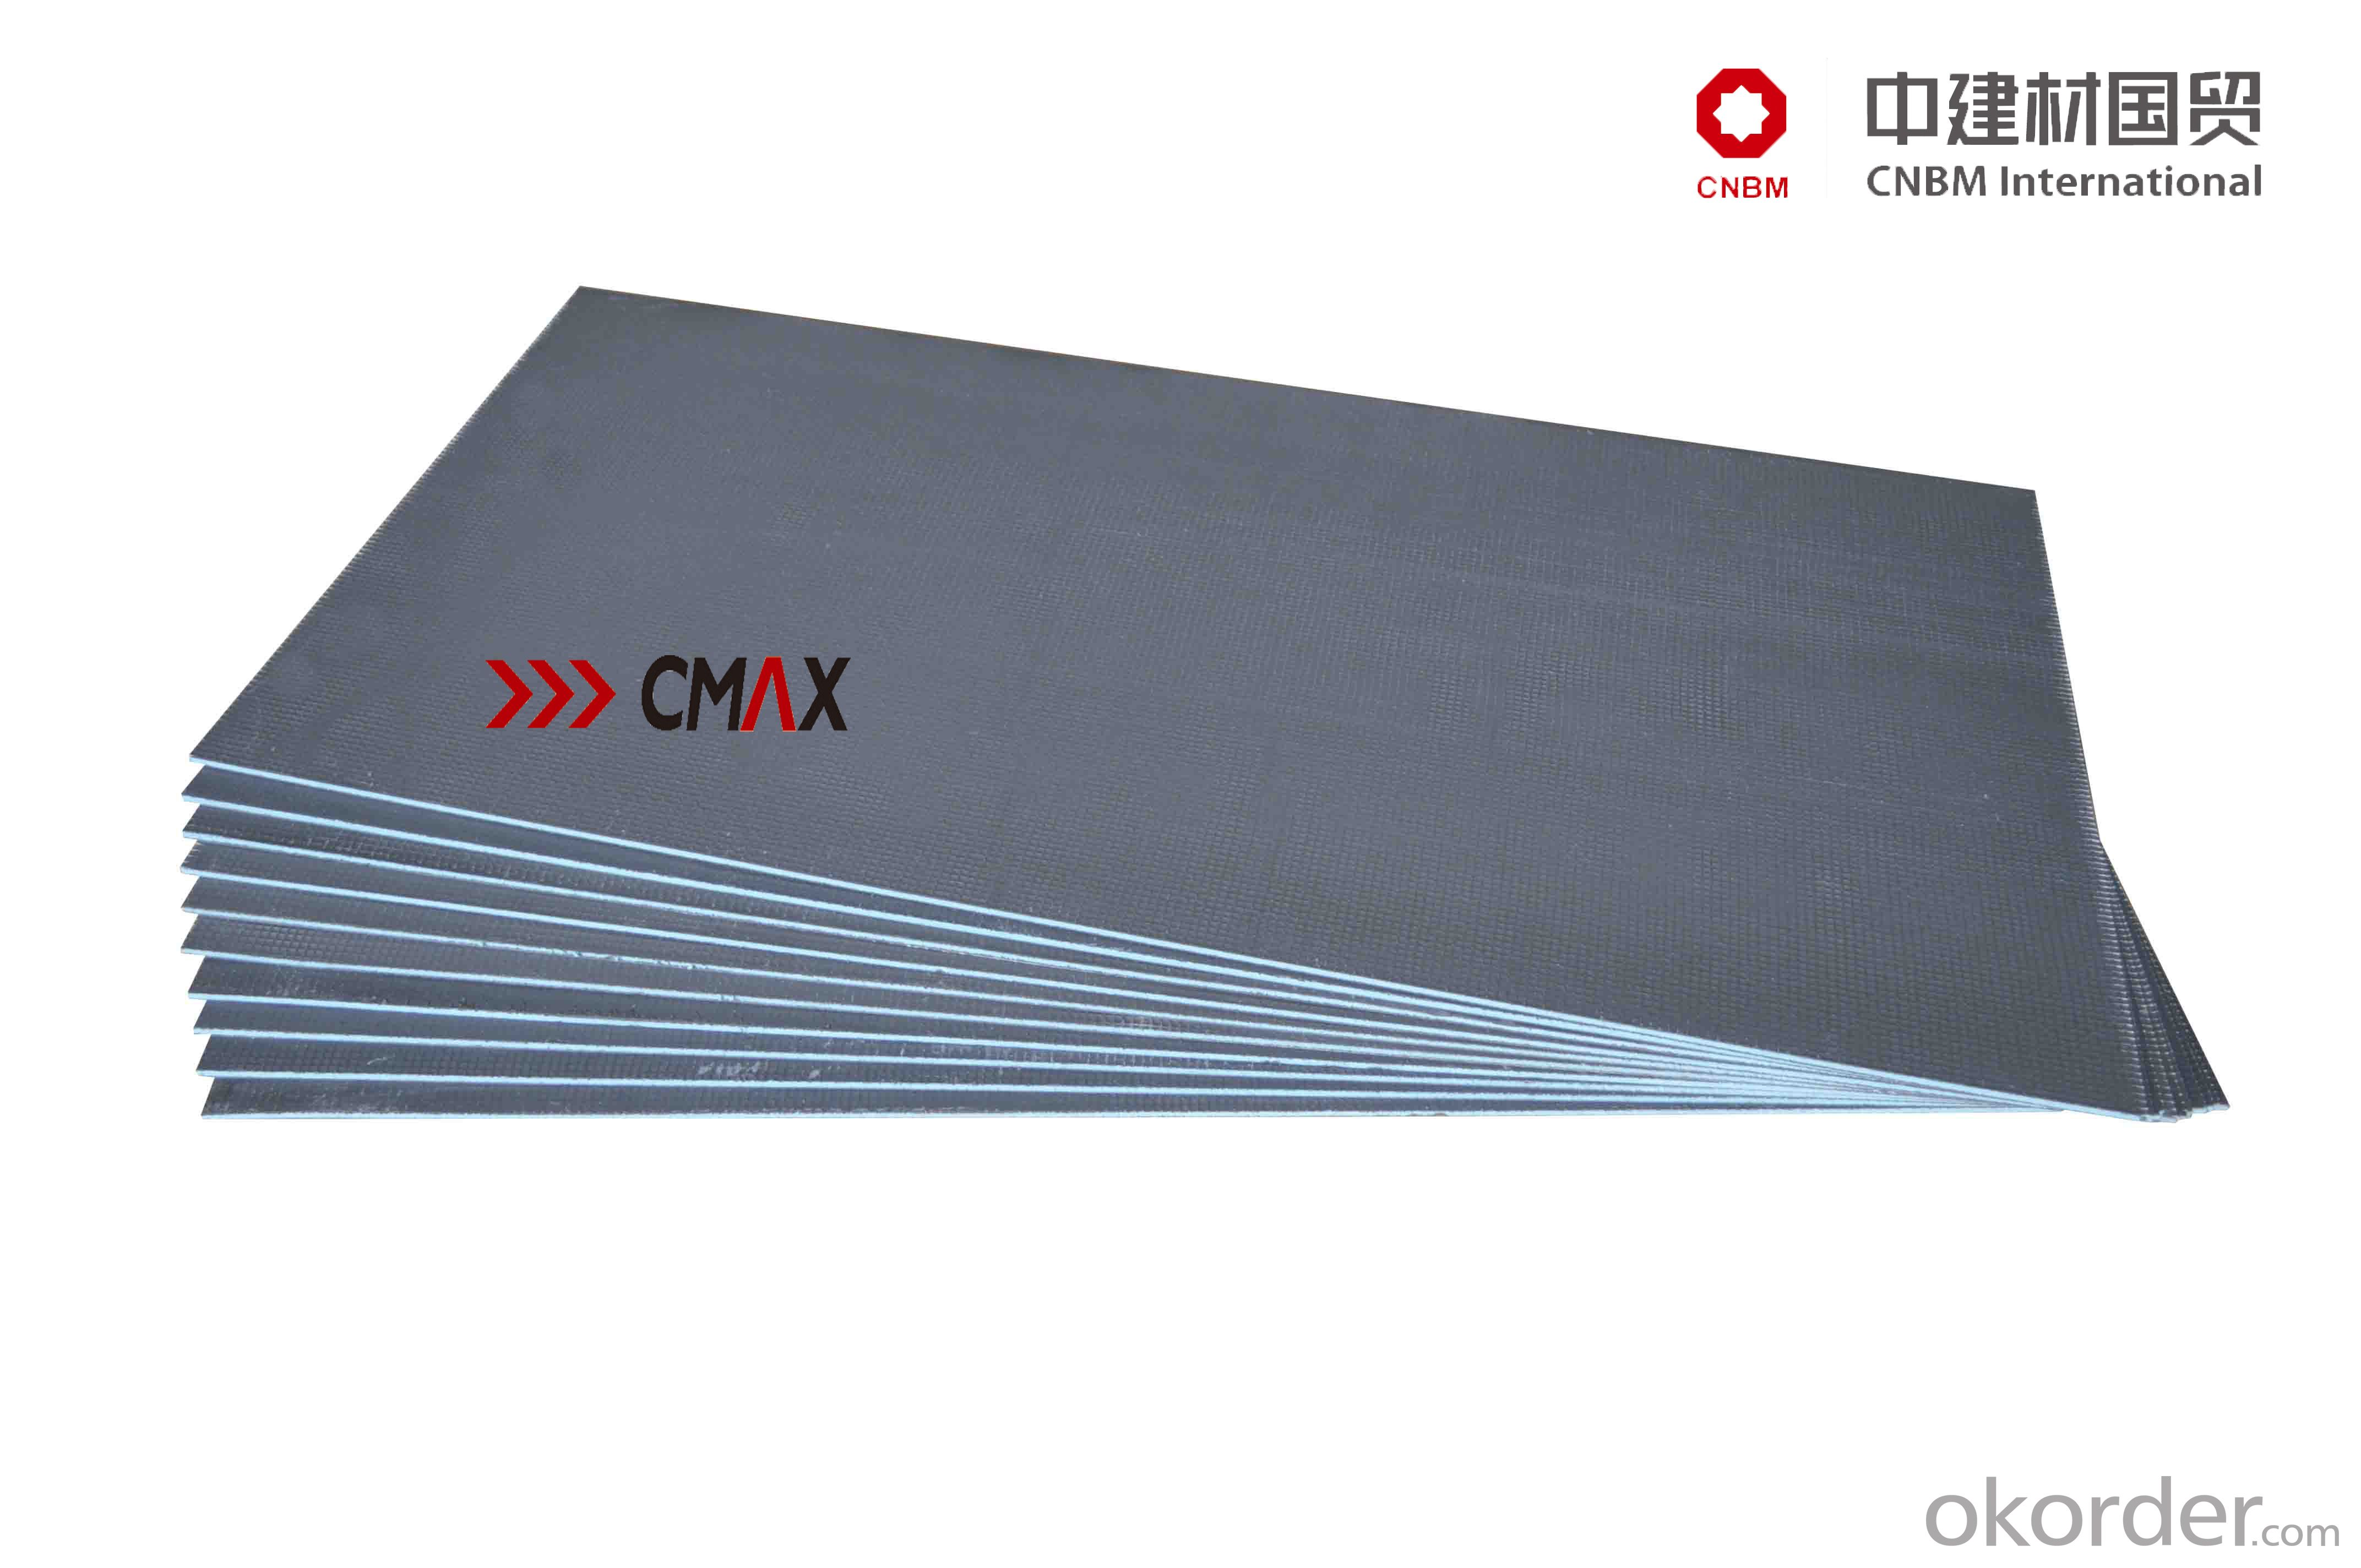 Buy Xps Foam Backer Board For Shower Room Cnbm Group Price